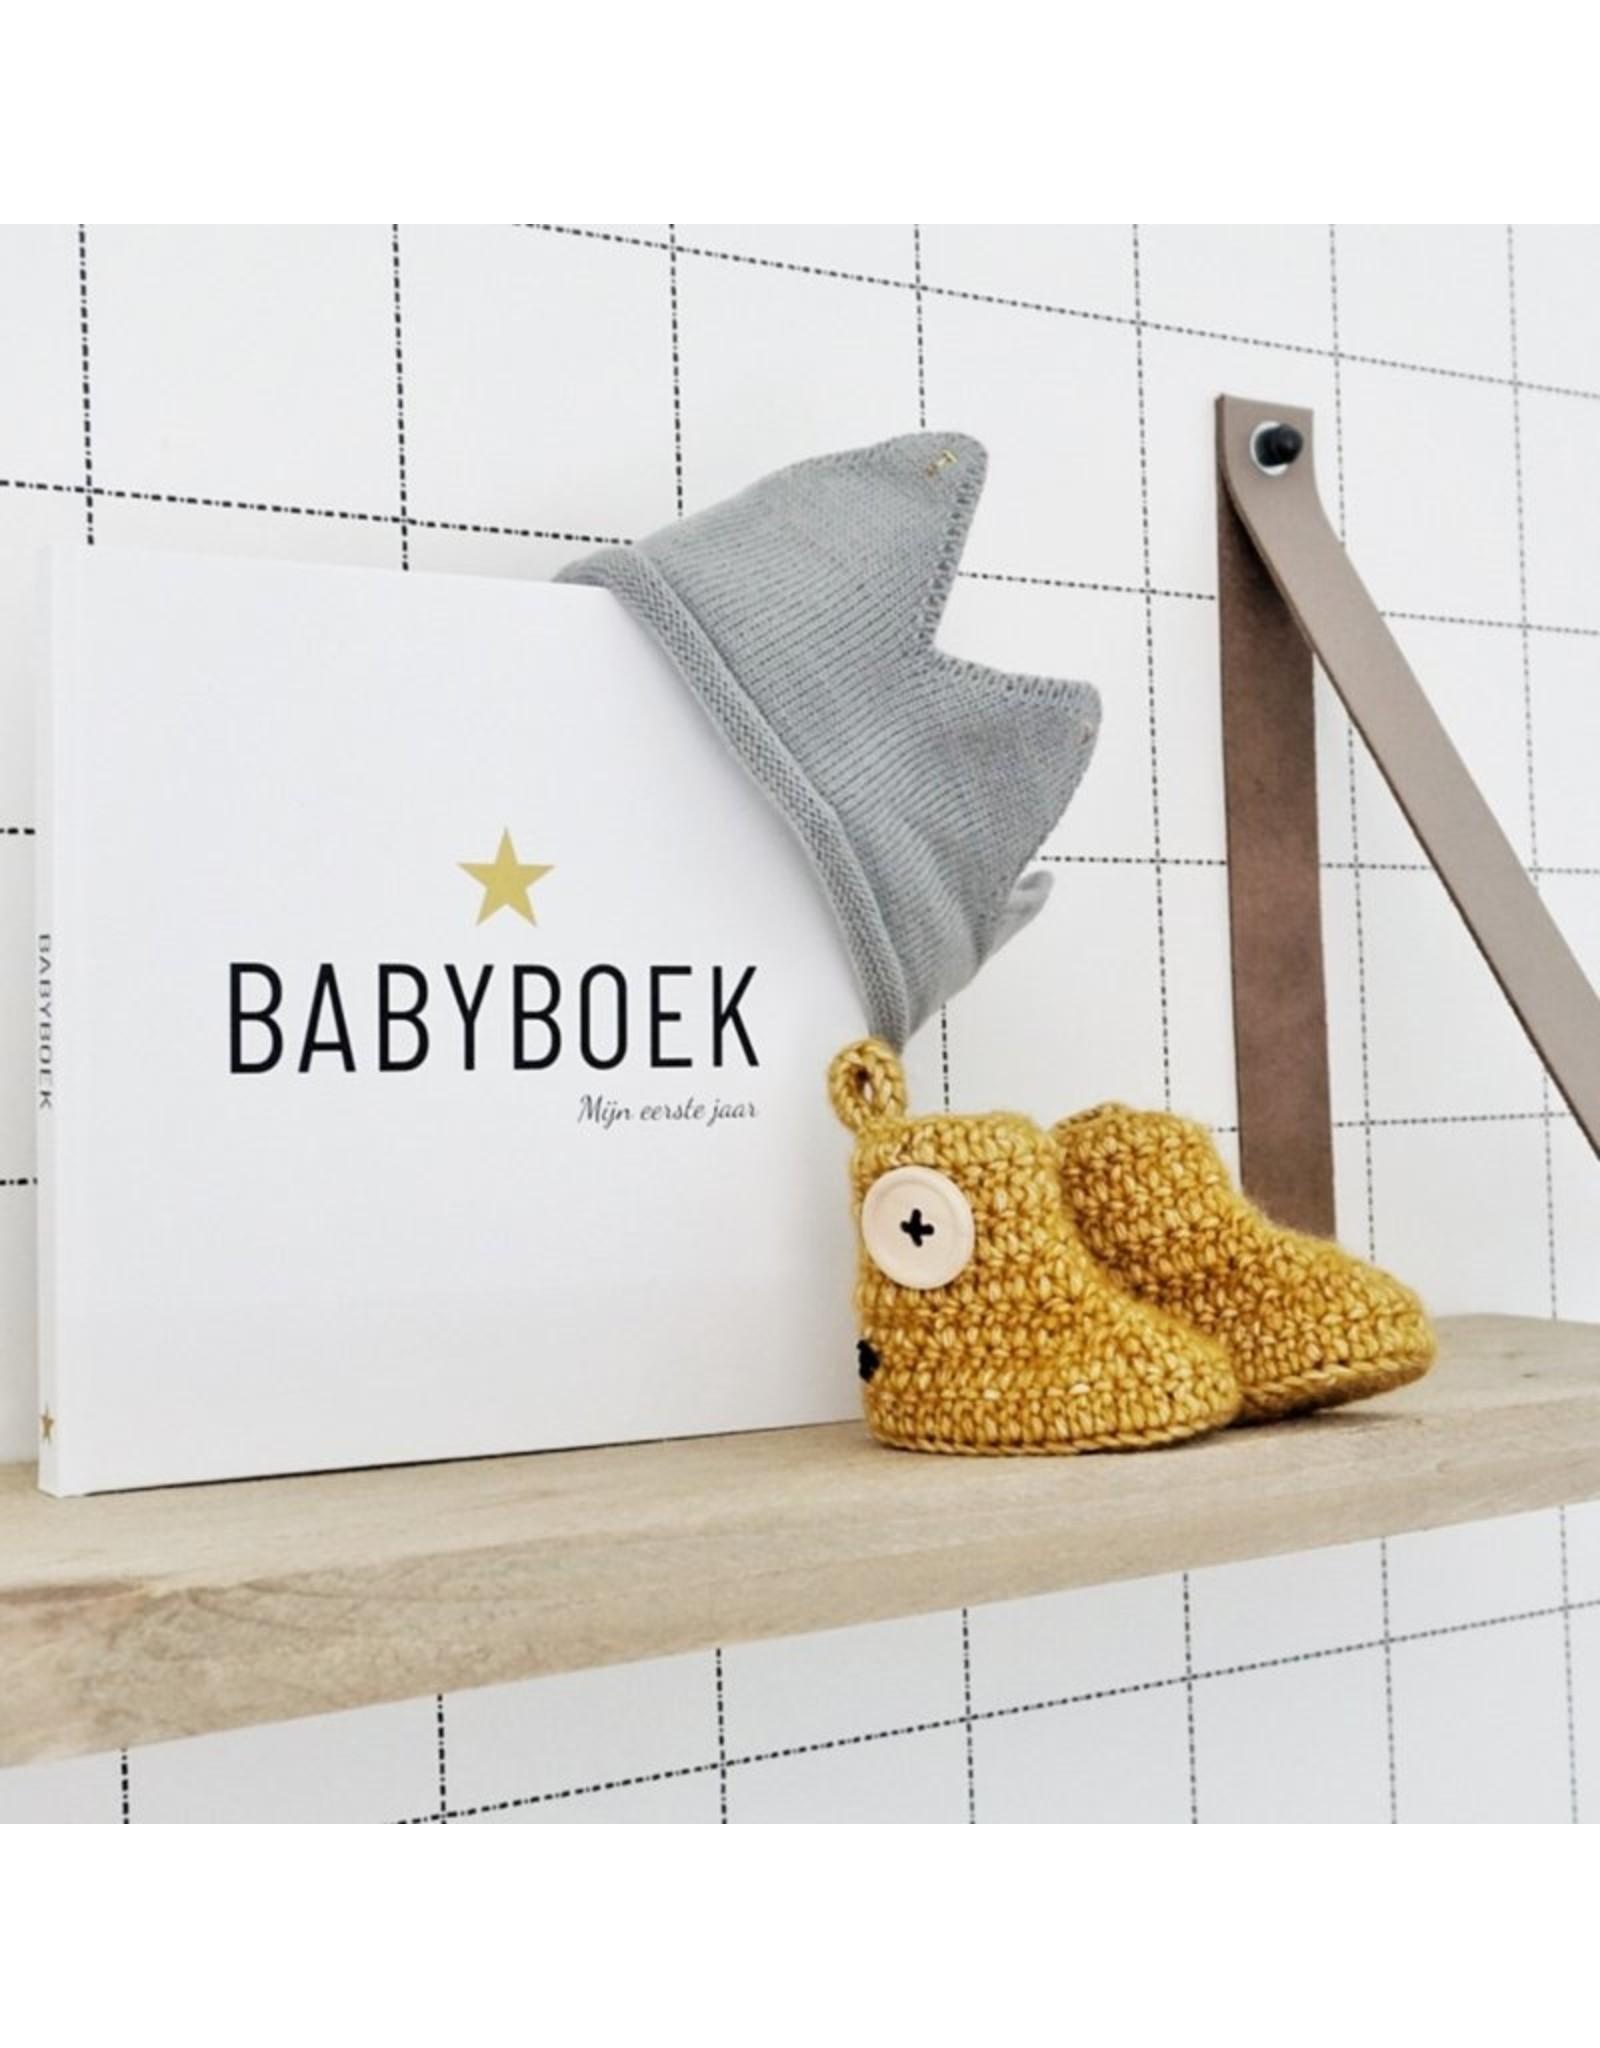 Lifestyle2 Love Lifestyle2Love  Invulboek Babyboek